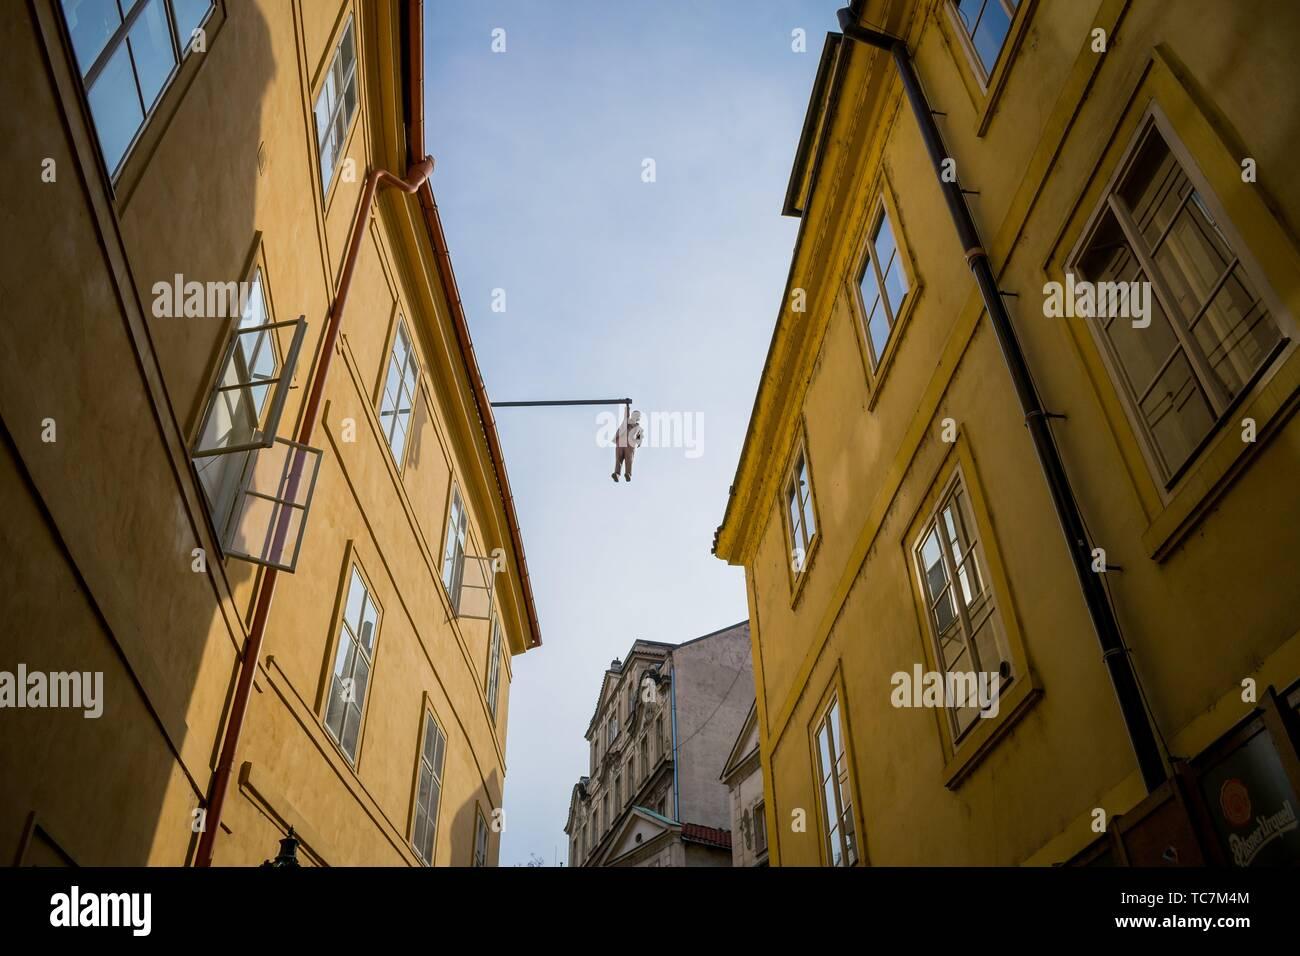 Hanging statue of Sigmund Freud in Husova street, Prague, Czech Republic - Stock Image